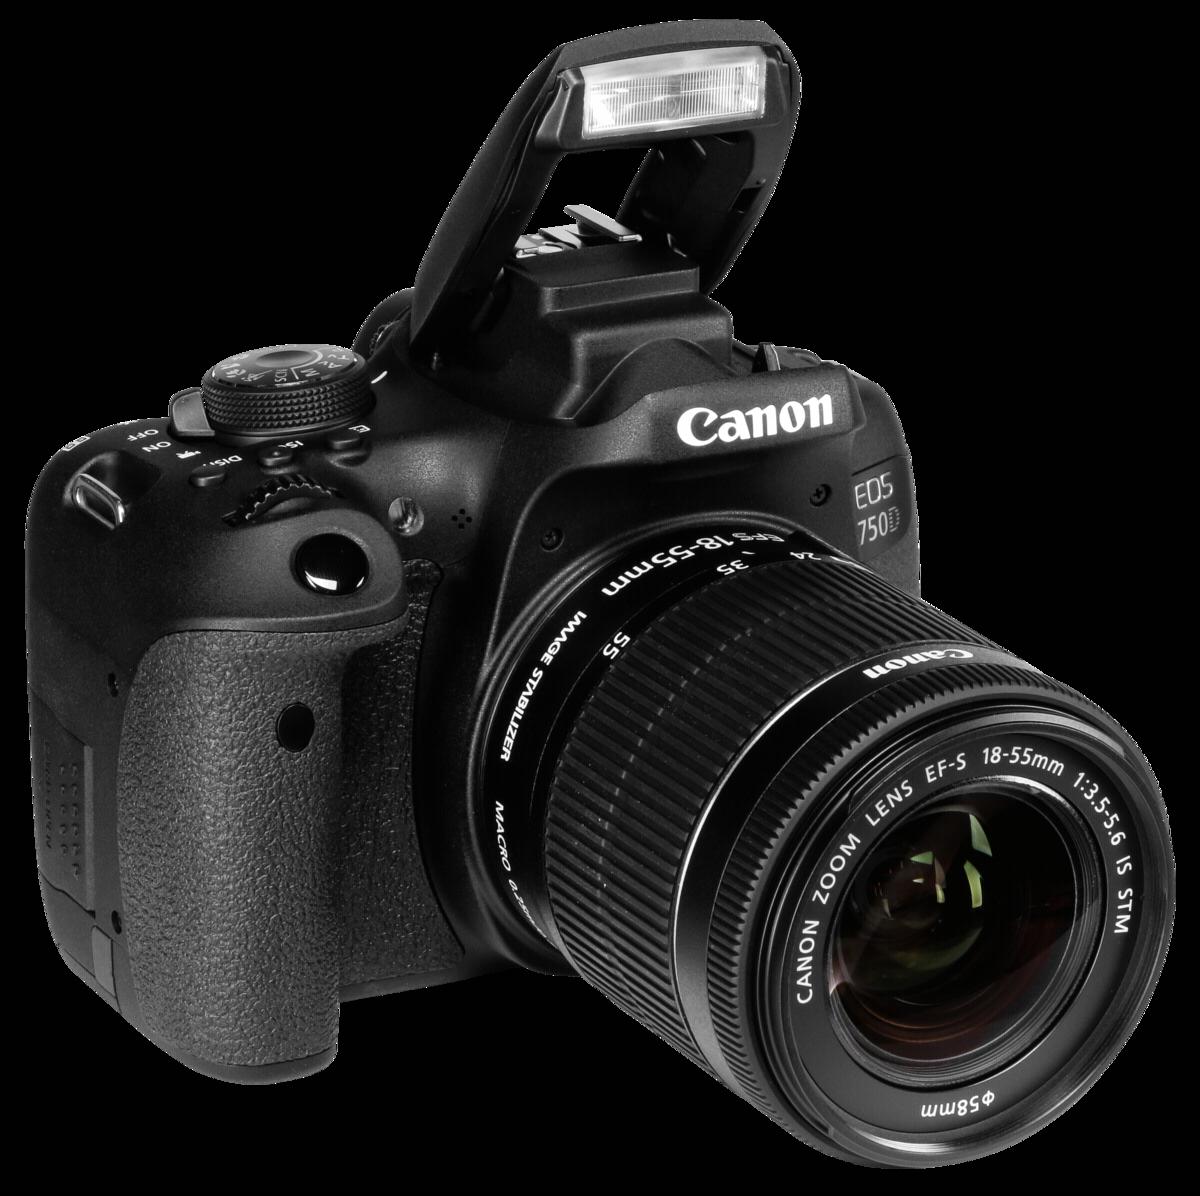 veidrodinis fotoaparatas canon eos 750d 18 55mm is stm komplektas. Black Bedroom Furniture Sets. Home Design Ideas